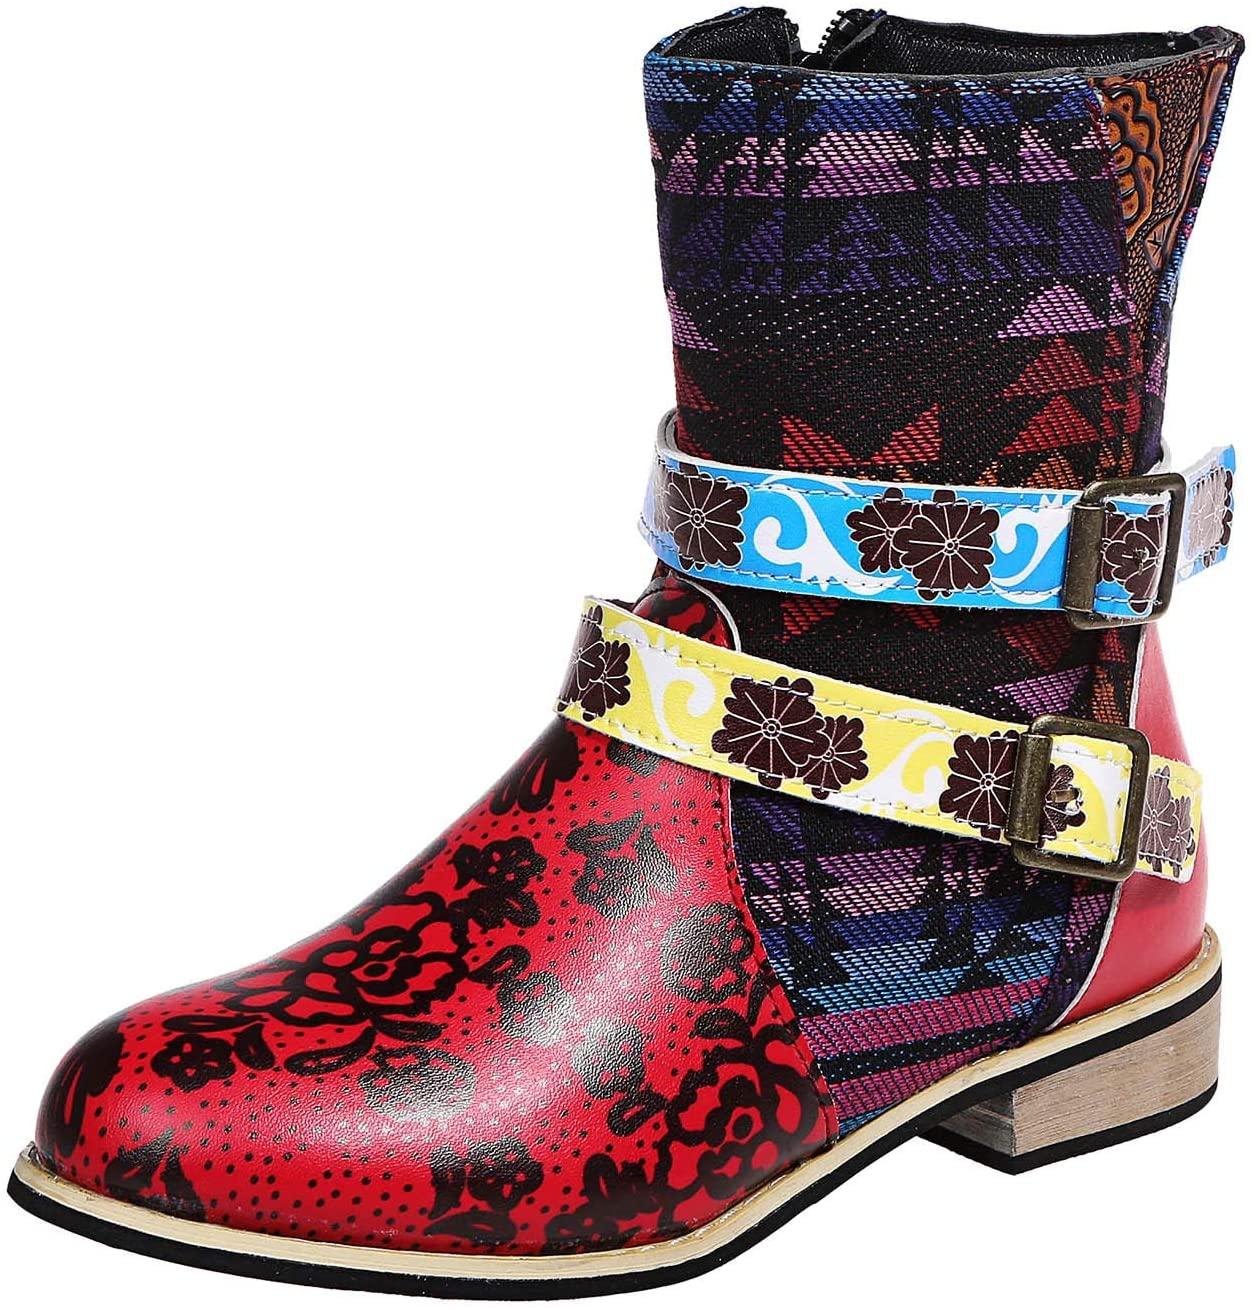 Padaleks Women's Retro Western Boot, Ankle Bootie for Women Faux Leather Vintage Fashion Short Boots Side Zipper Floral Pattern Roman Shoes